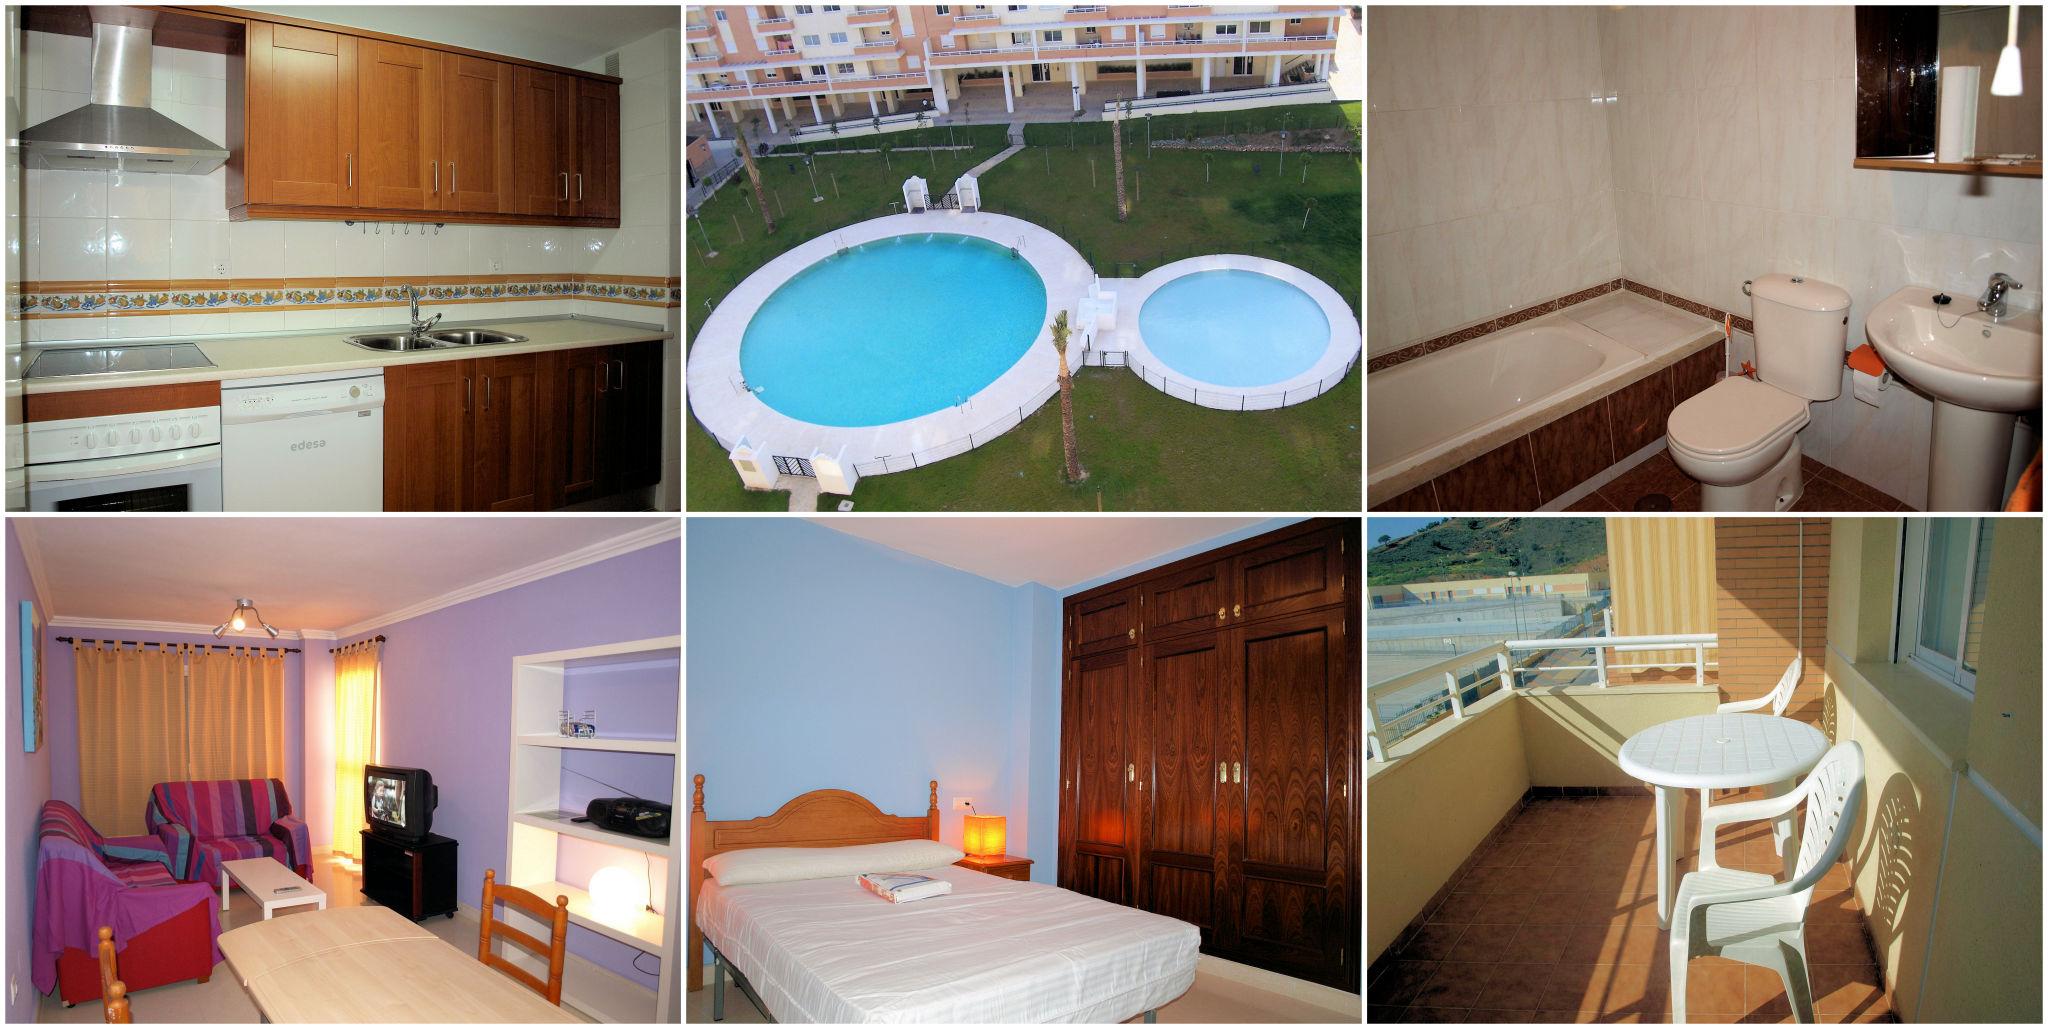 Fiscalidad de apartamentos turisticos